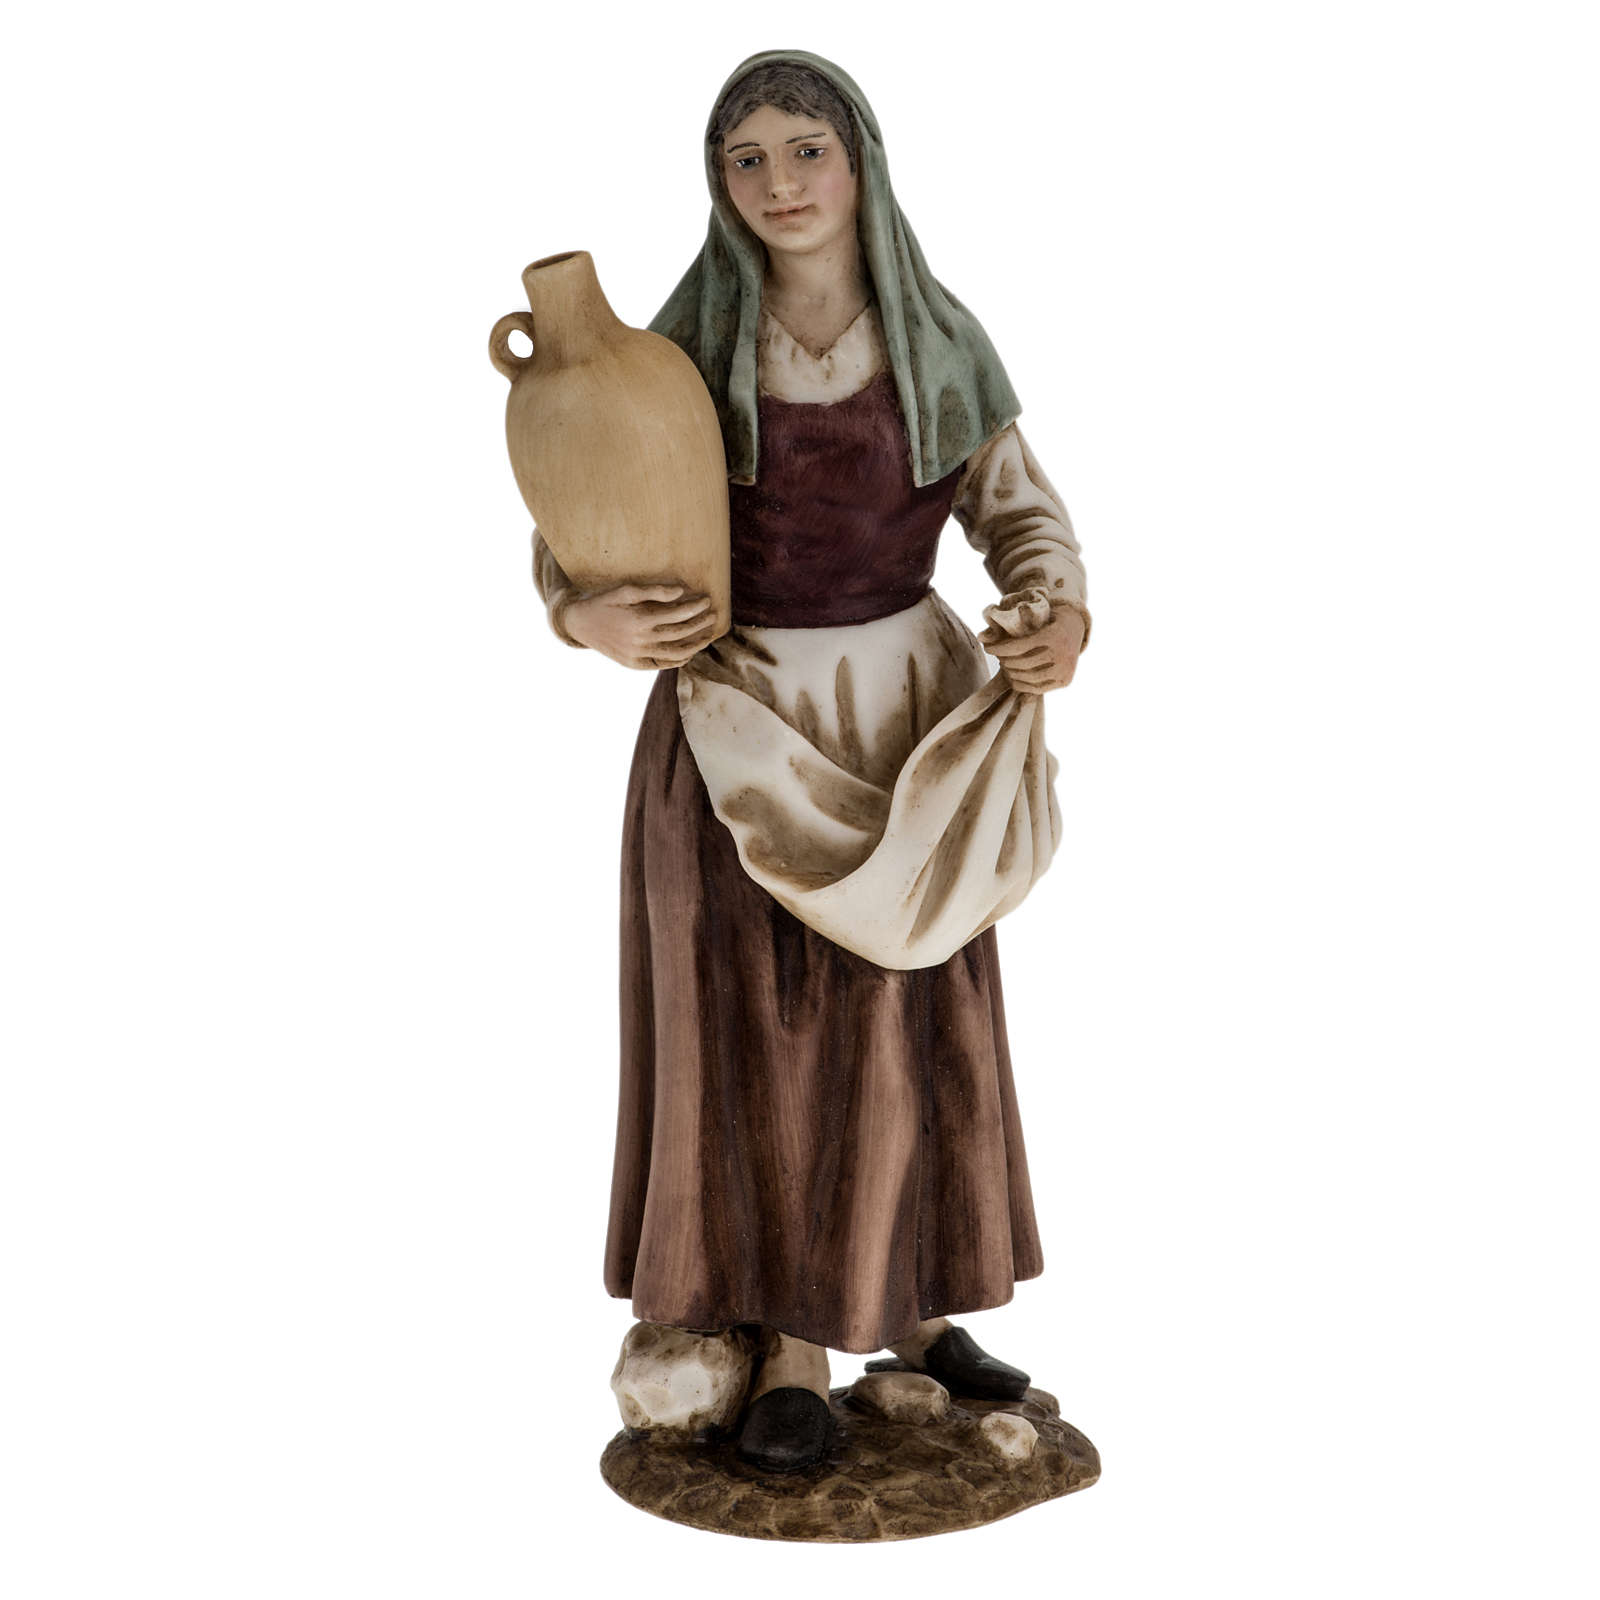 Donna con anfora 18 cm presepe Landi 3